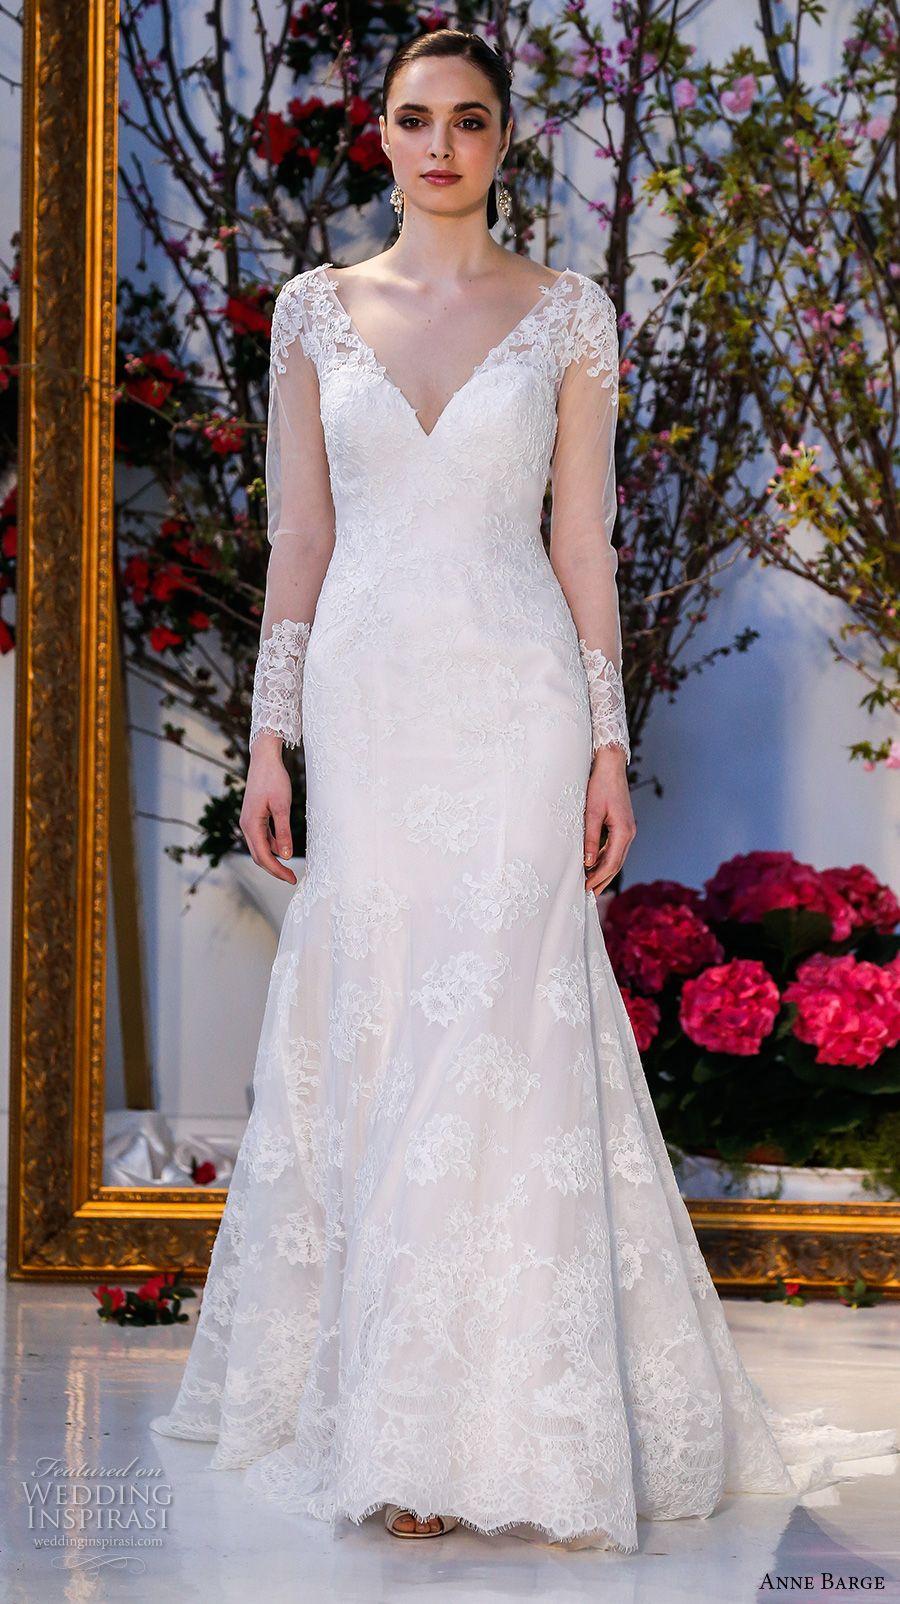 Anne barge spring wedding dresses anne barge wedding dress